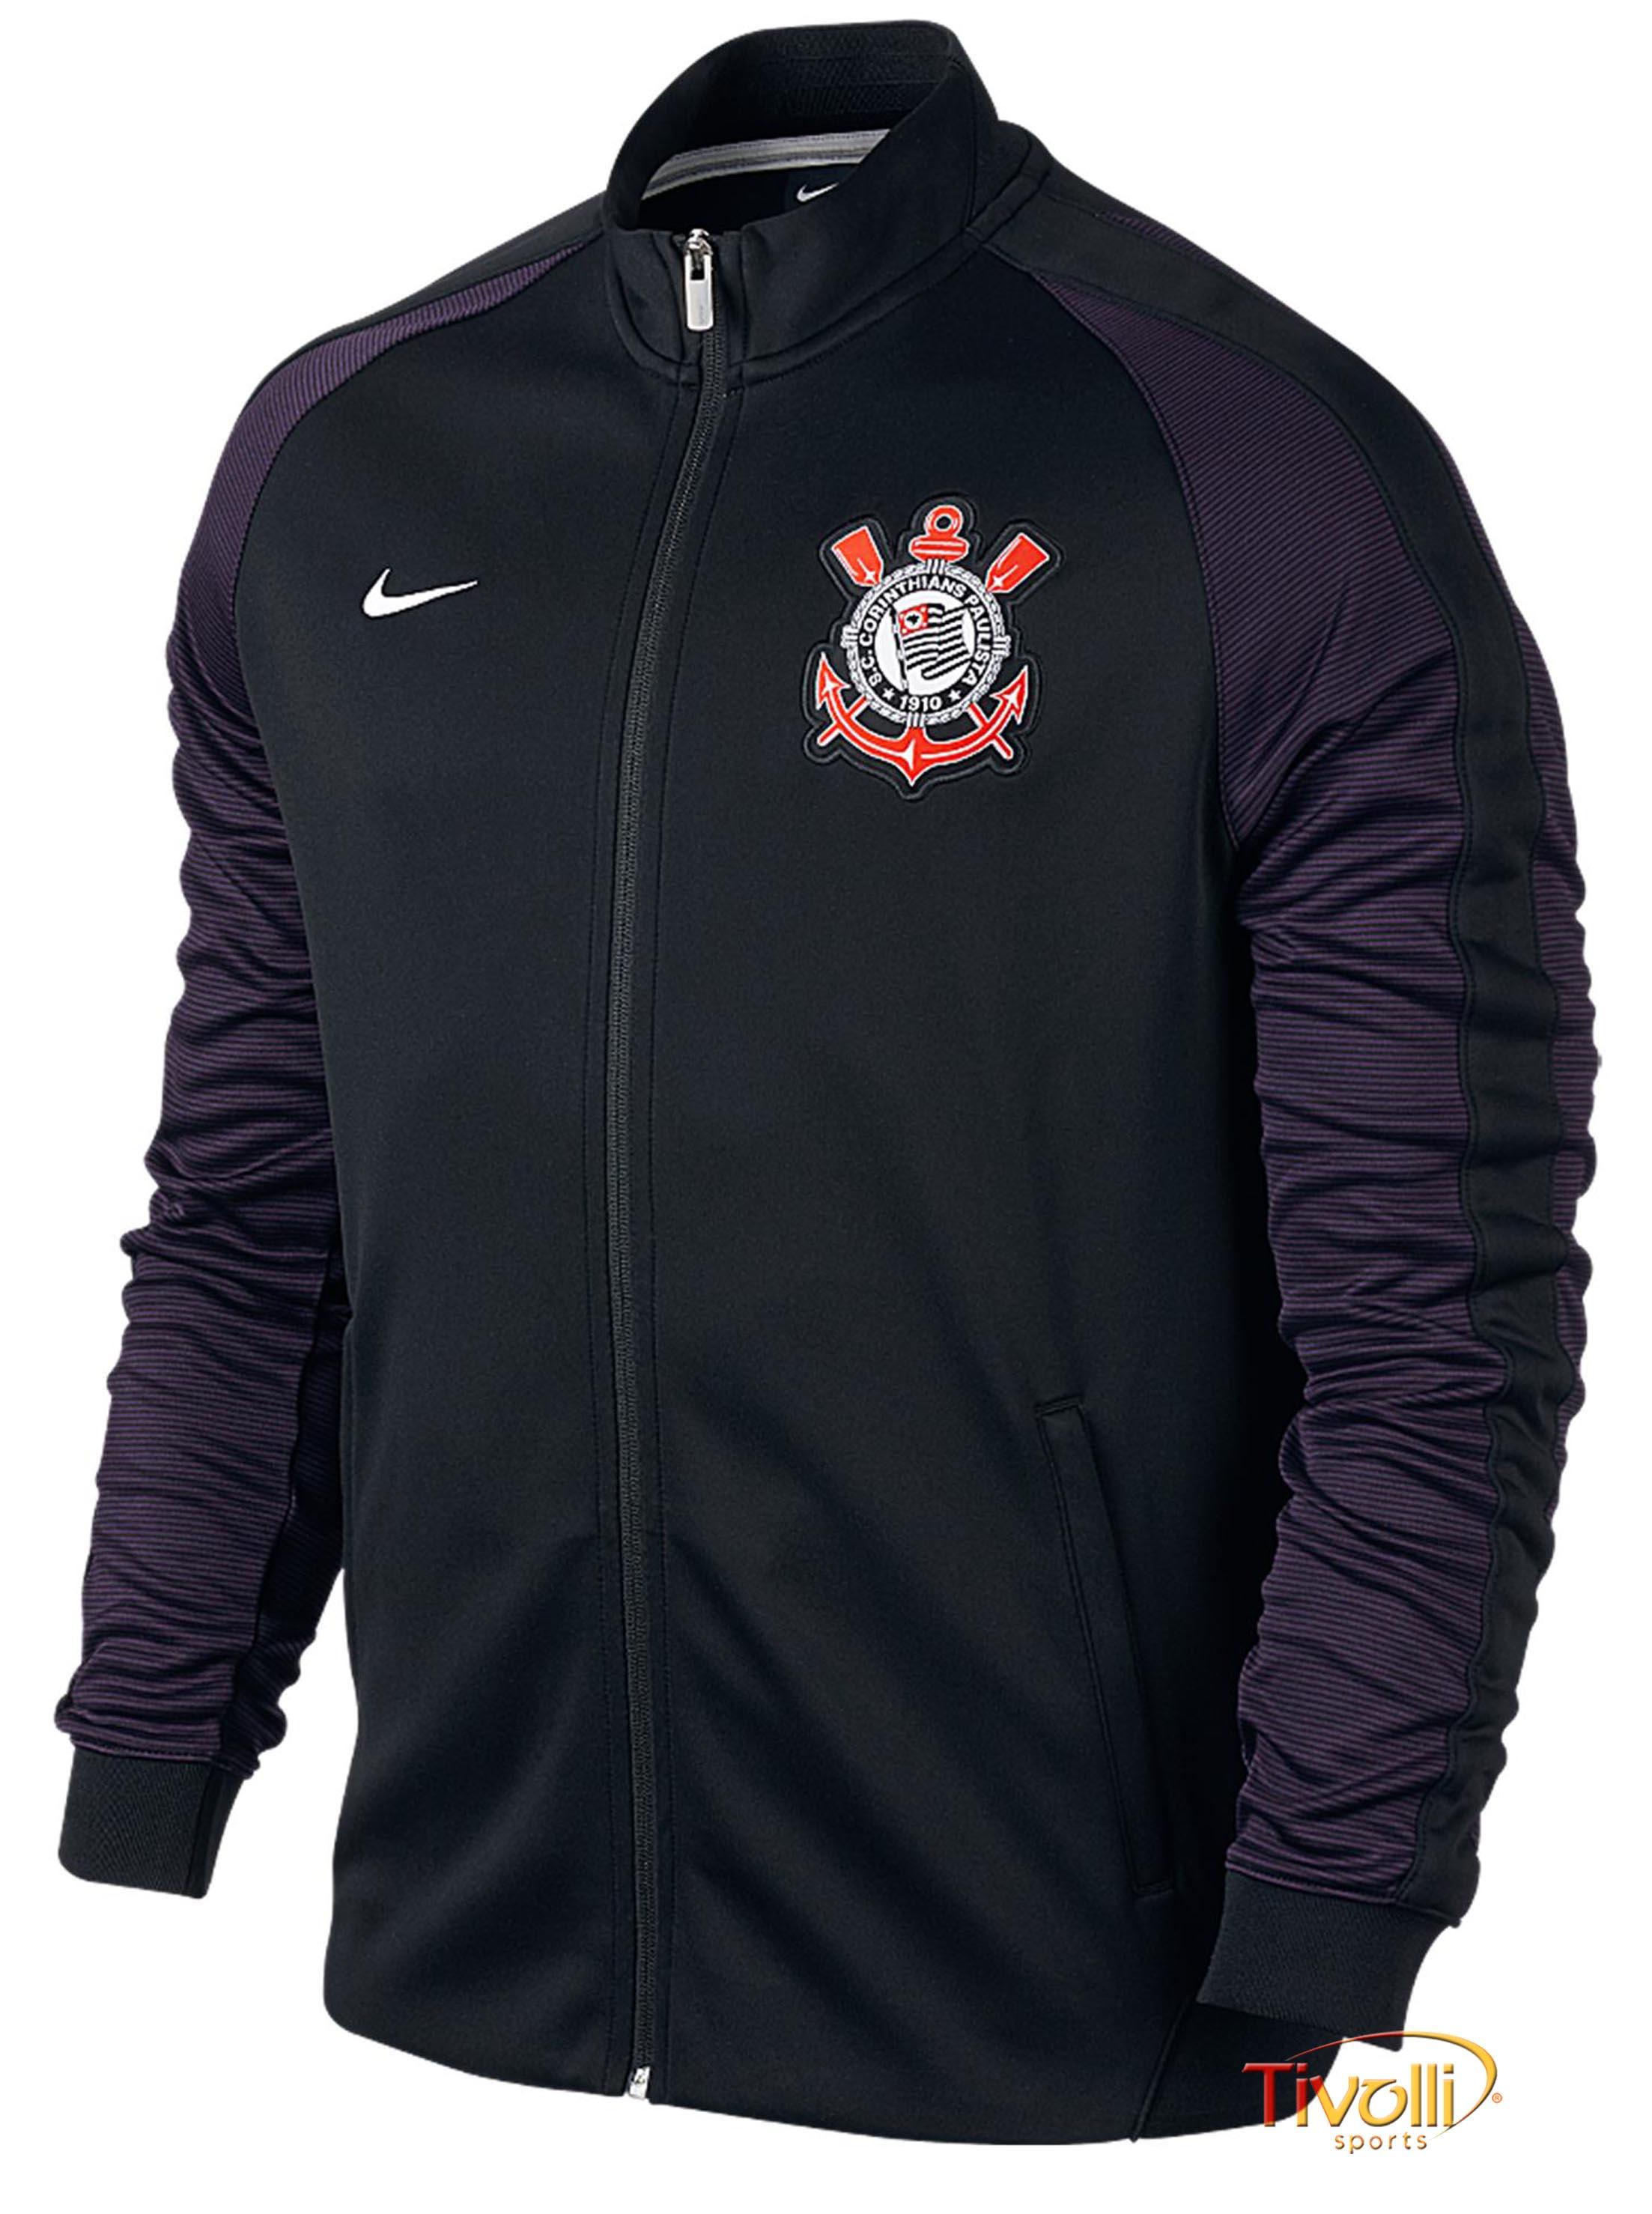 4b9b0c5fa73 Jaqueta Nike Corinthians N98  a9b67121b62 Jaqueta Corinthians  N98 Authentic Nike Preta e Roxa ... a0b830f6df252